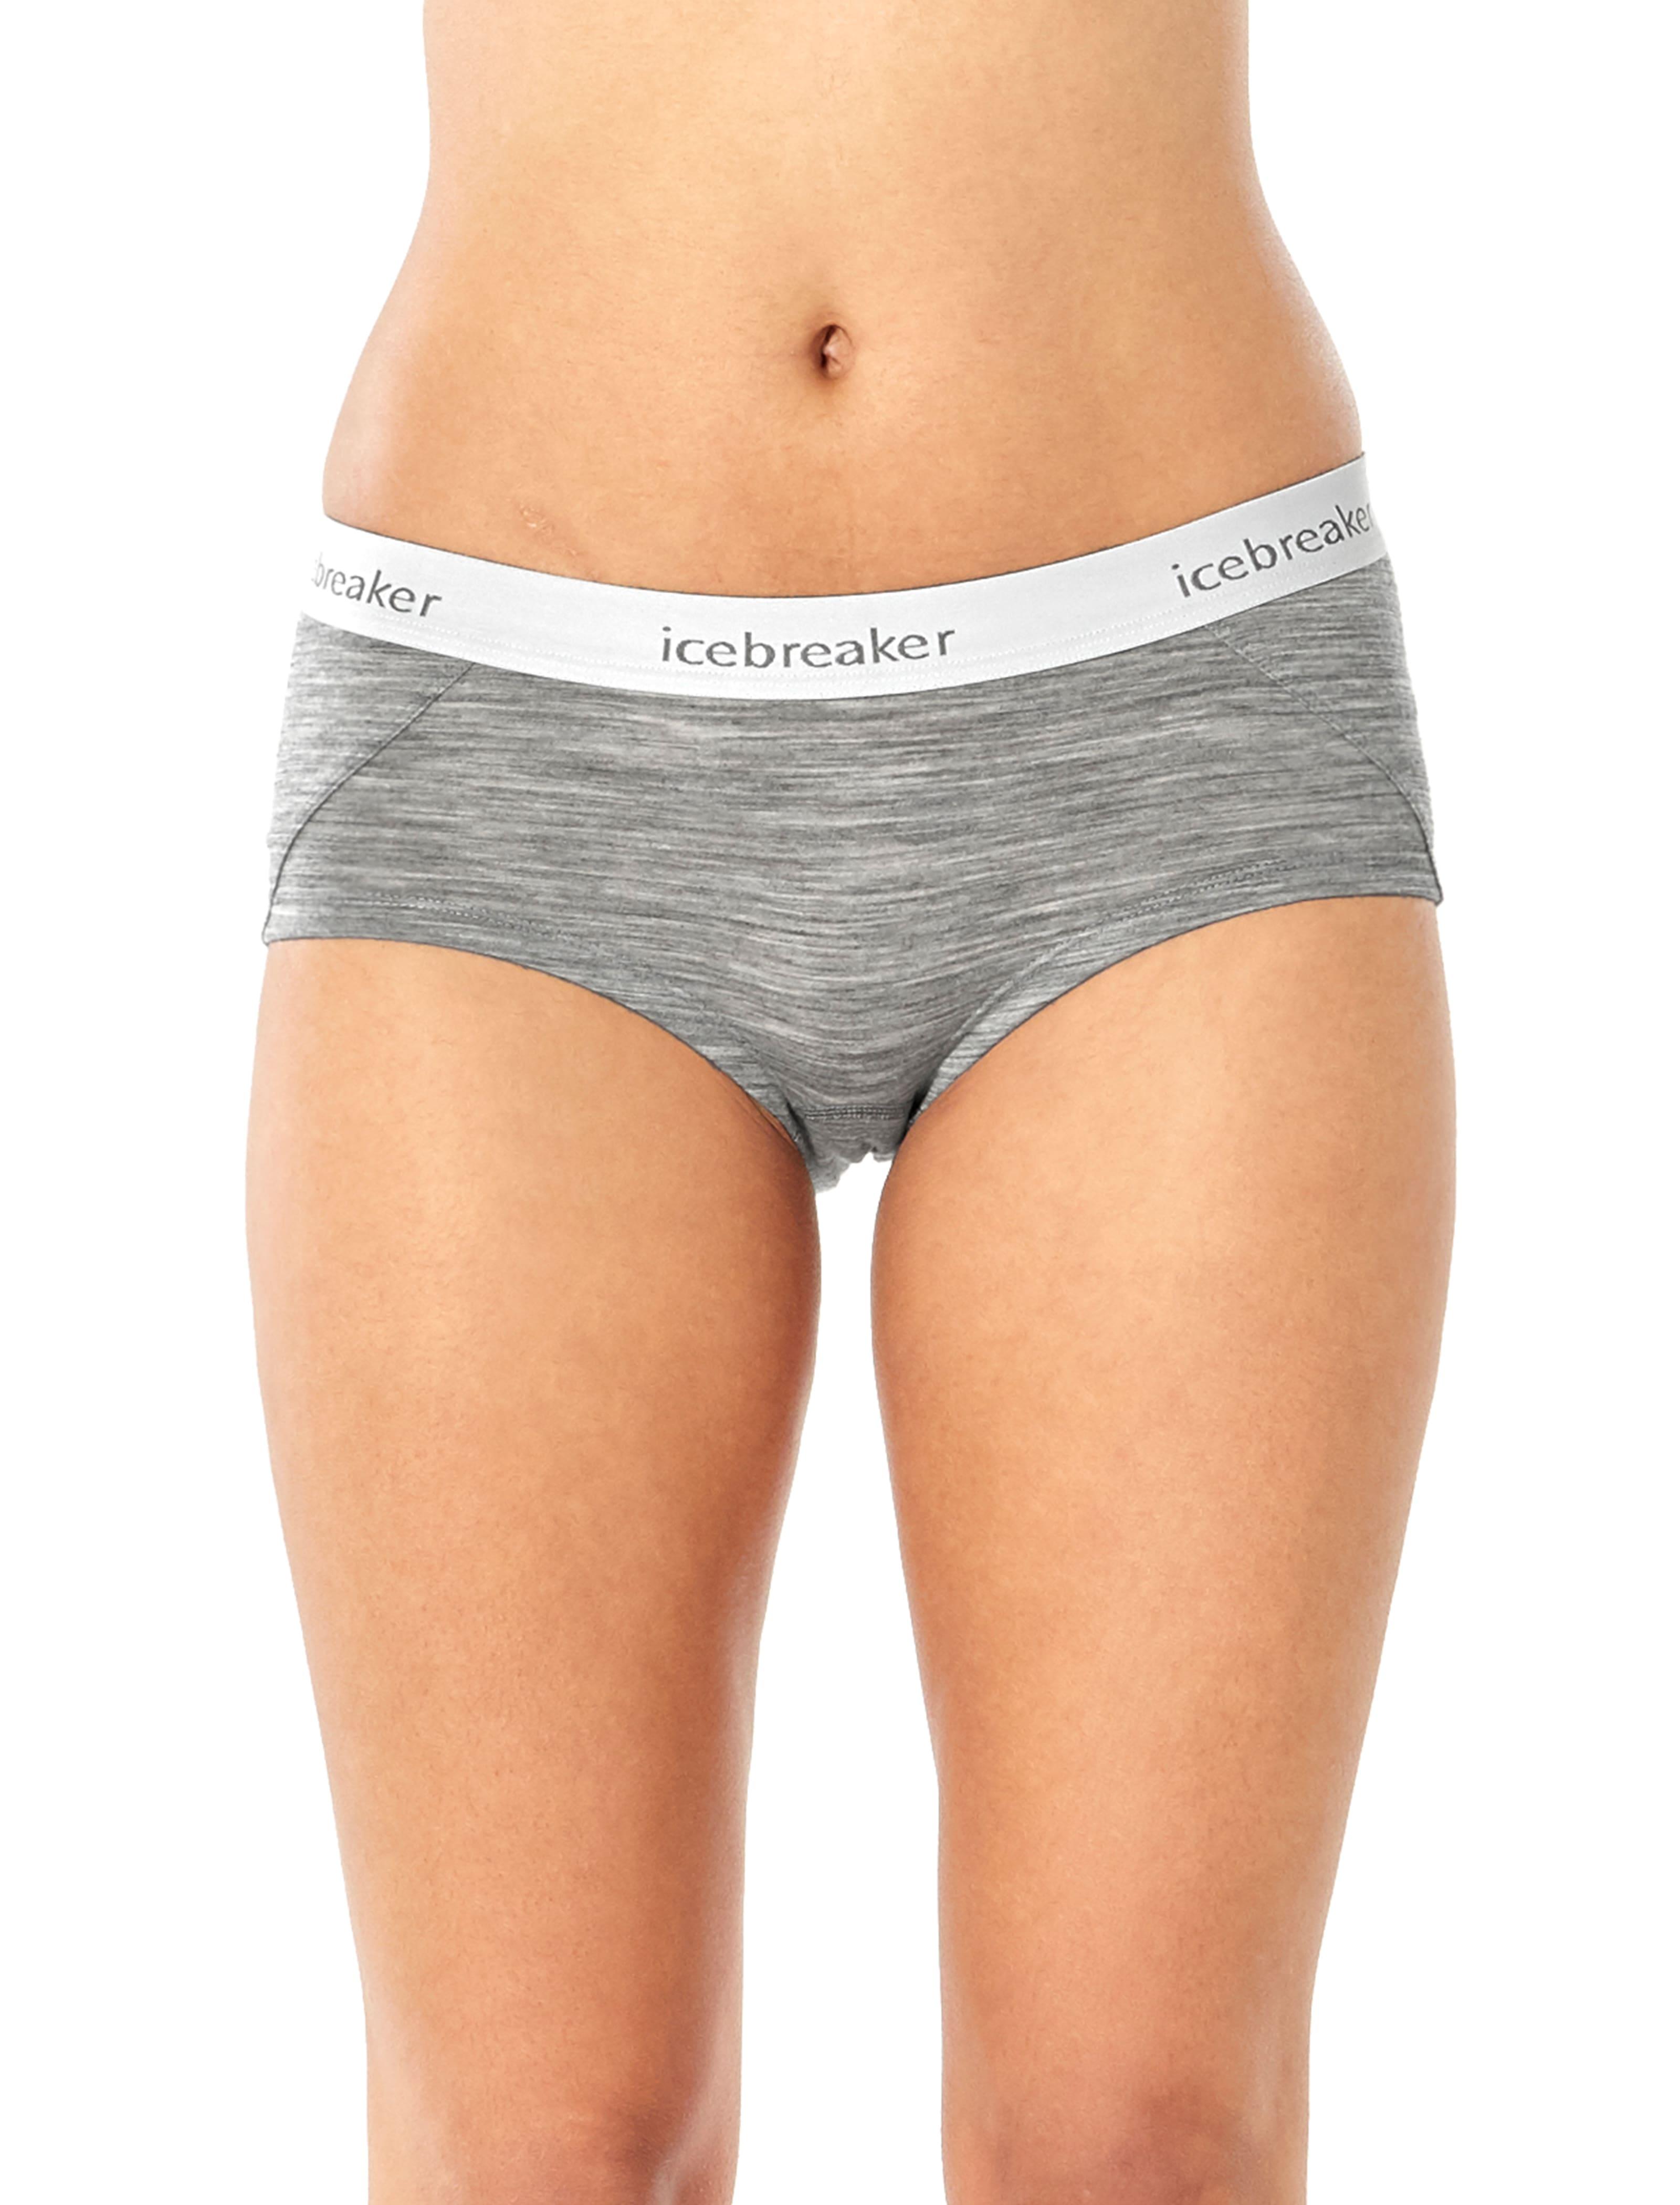 Icebreaker - Sprite Hot Pants